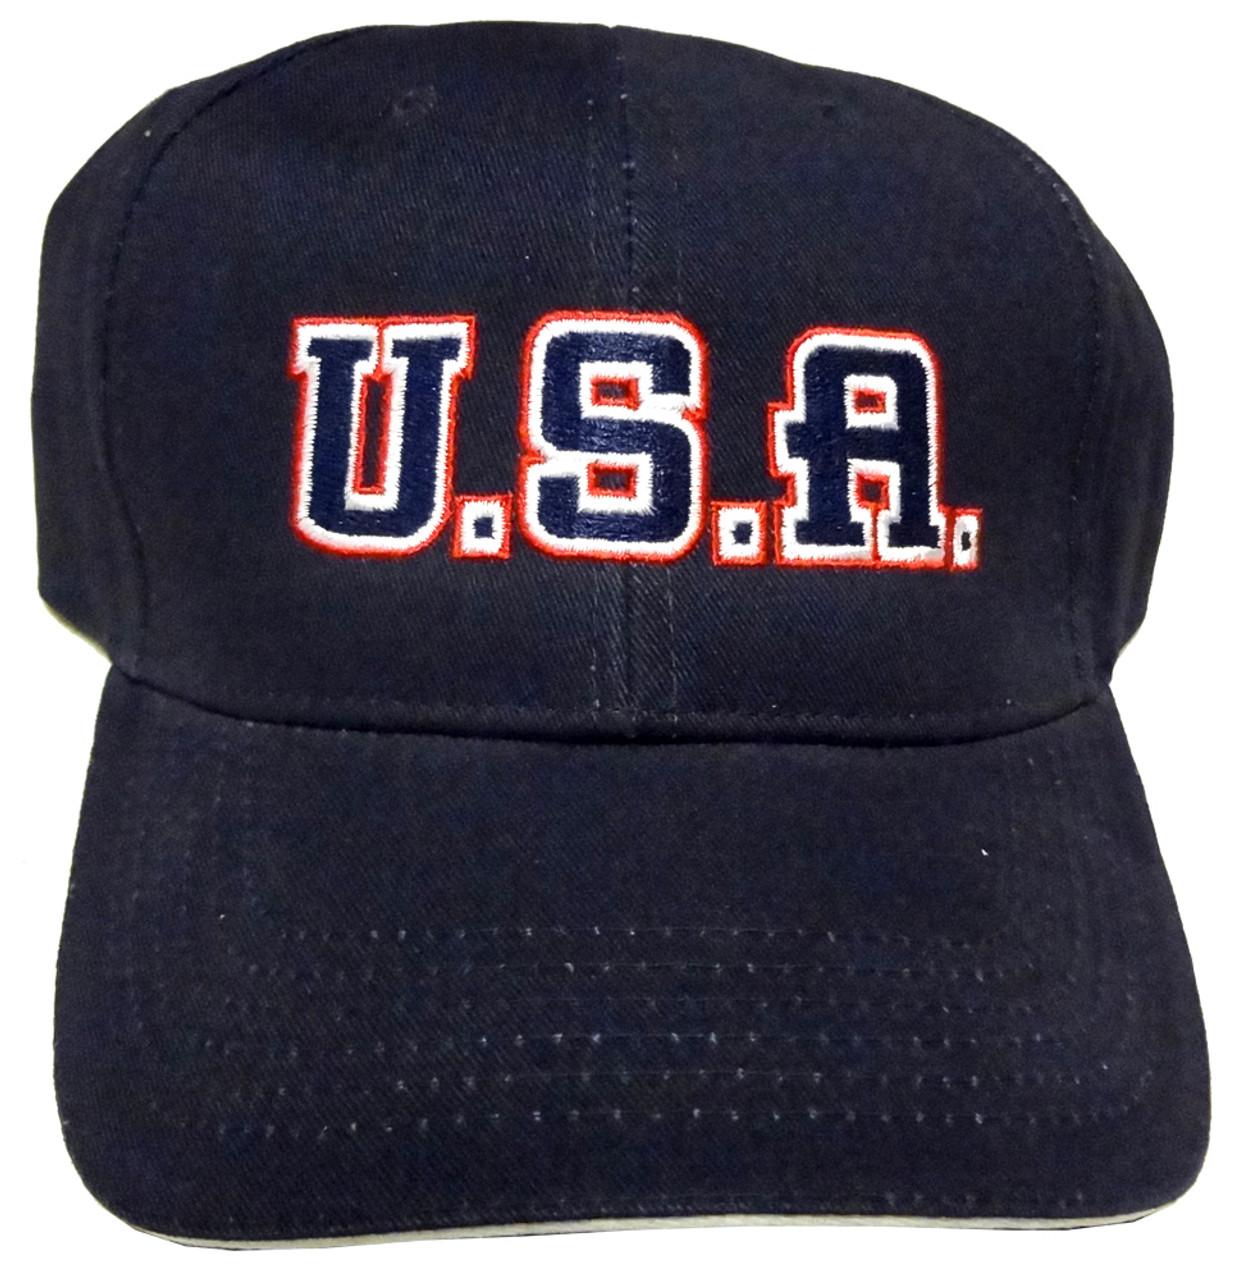 U.S.A. Embroidered Baseball Cap - Made In America Store 7db2fedce35f